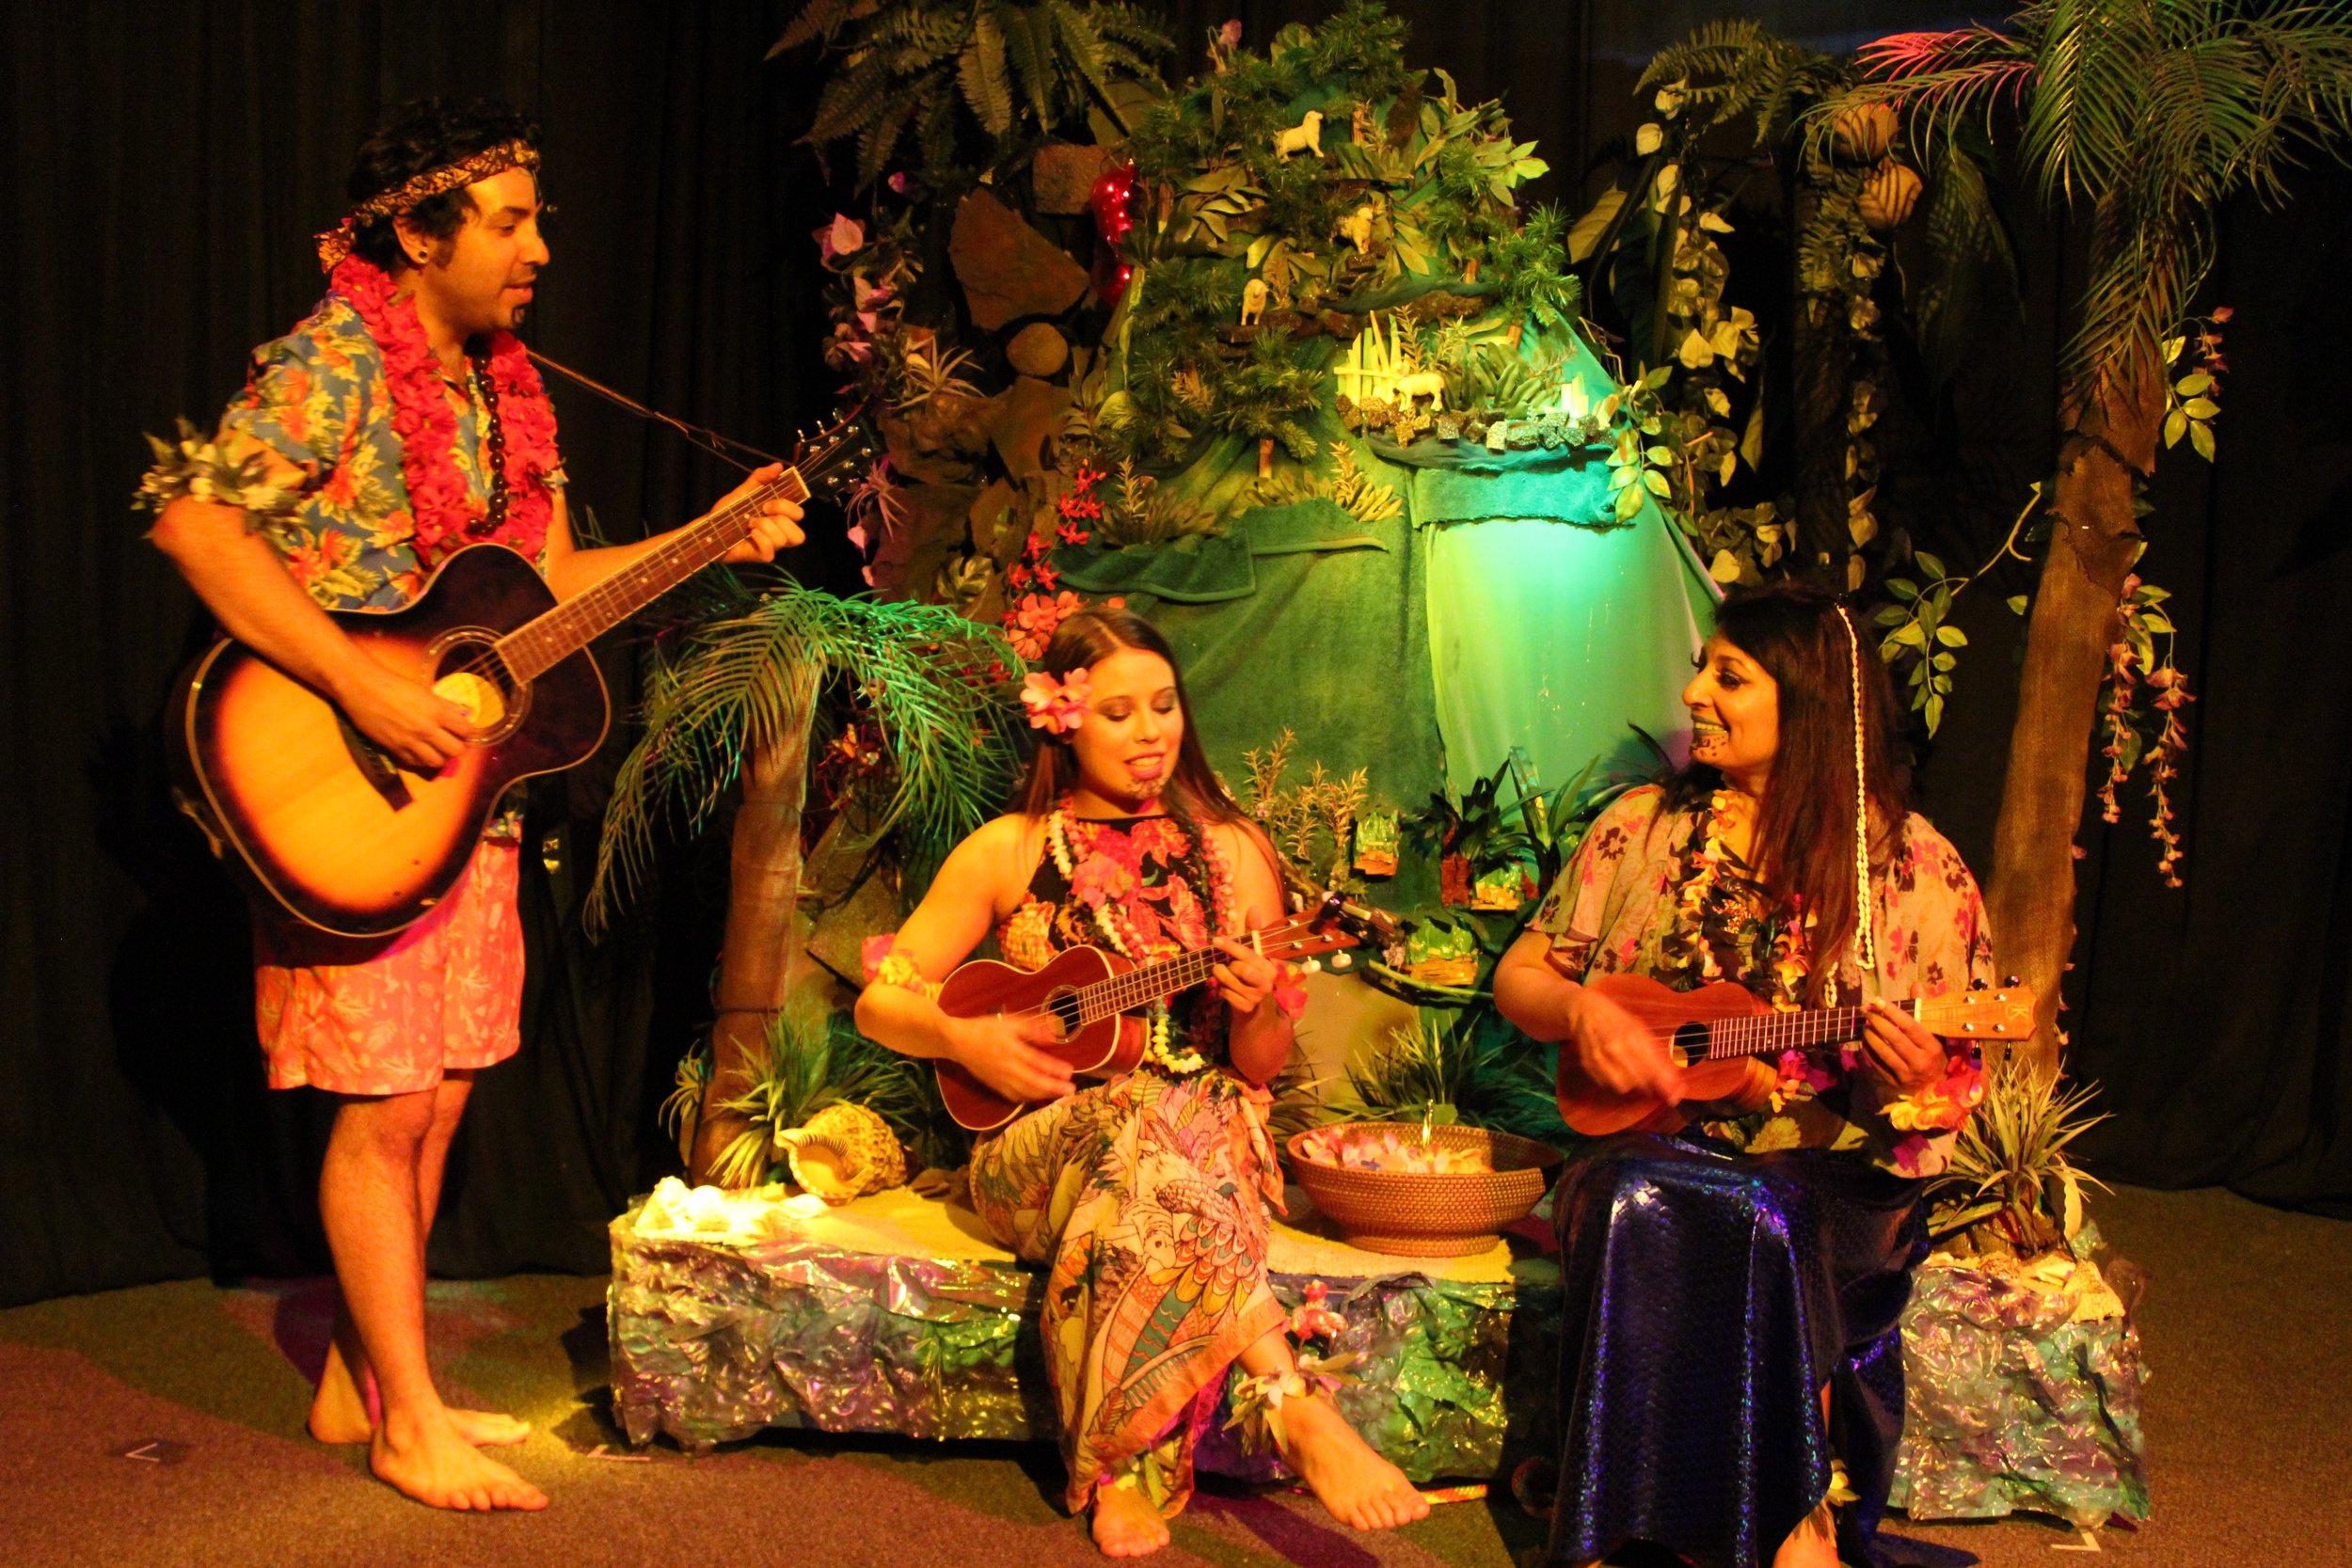 Aloha: Postcards from Polynesia Photo by Patti Murtha